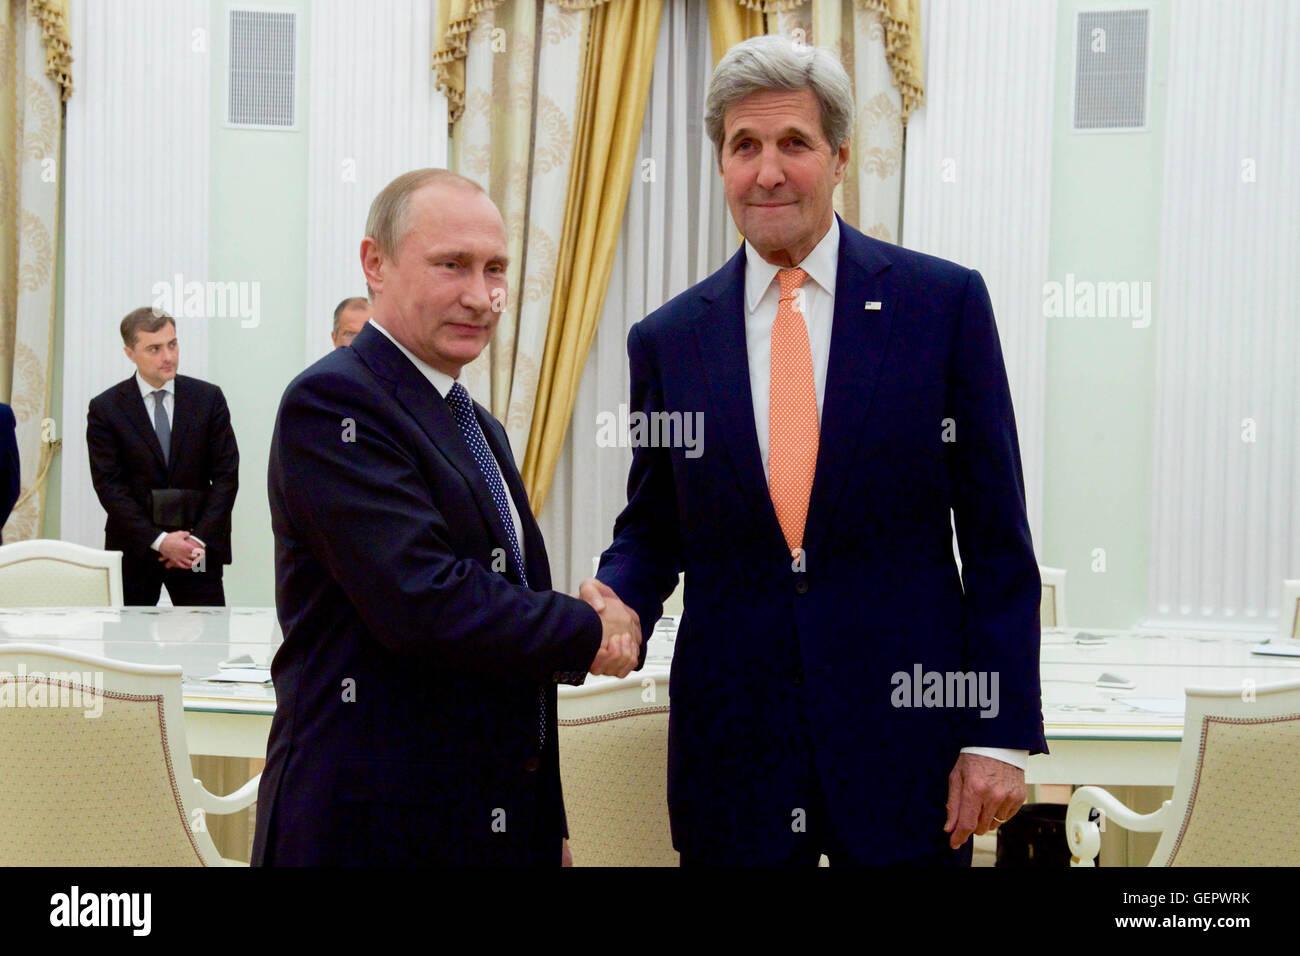 Secretary Kerry Shakes Hands With Russian President Vladimir Putin - Stock Image